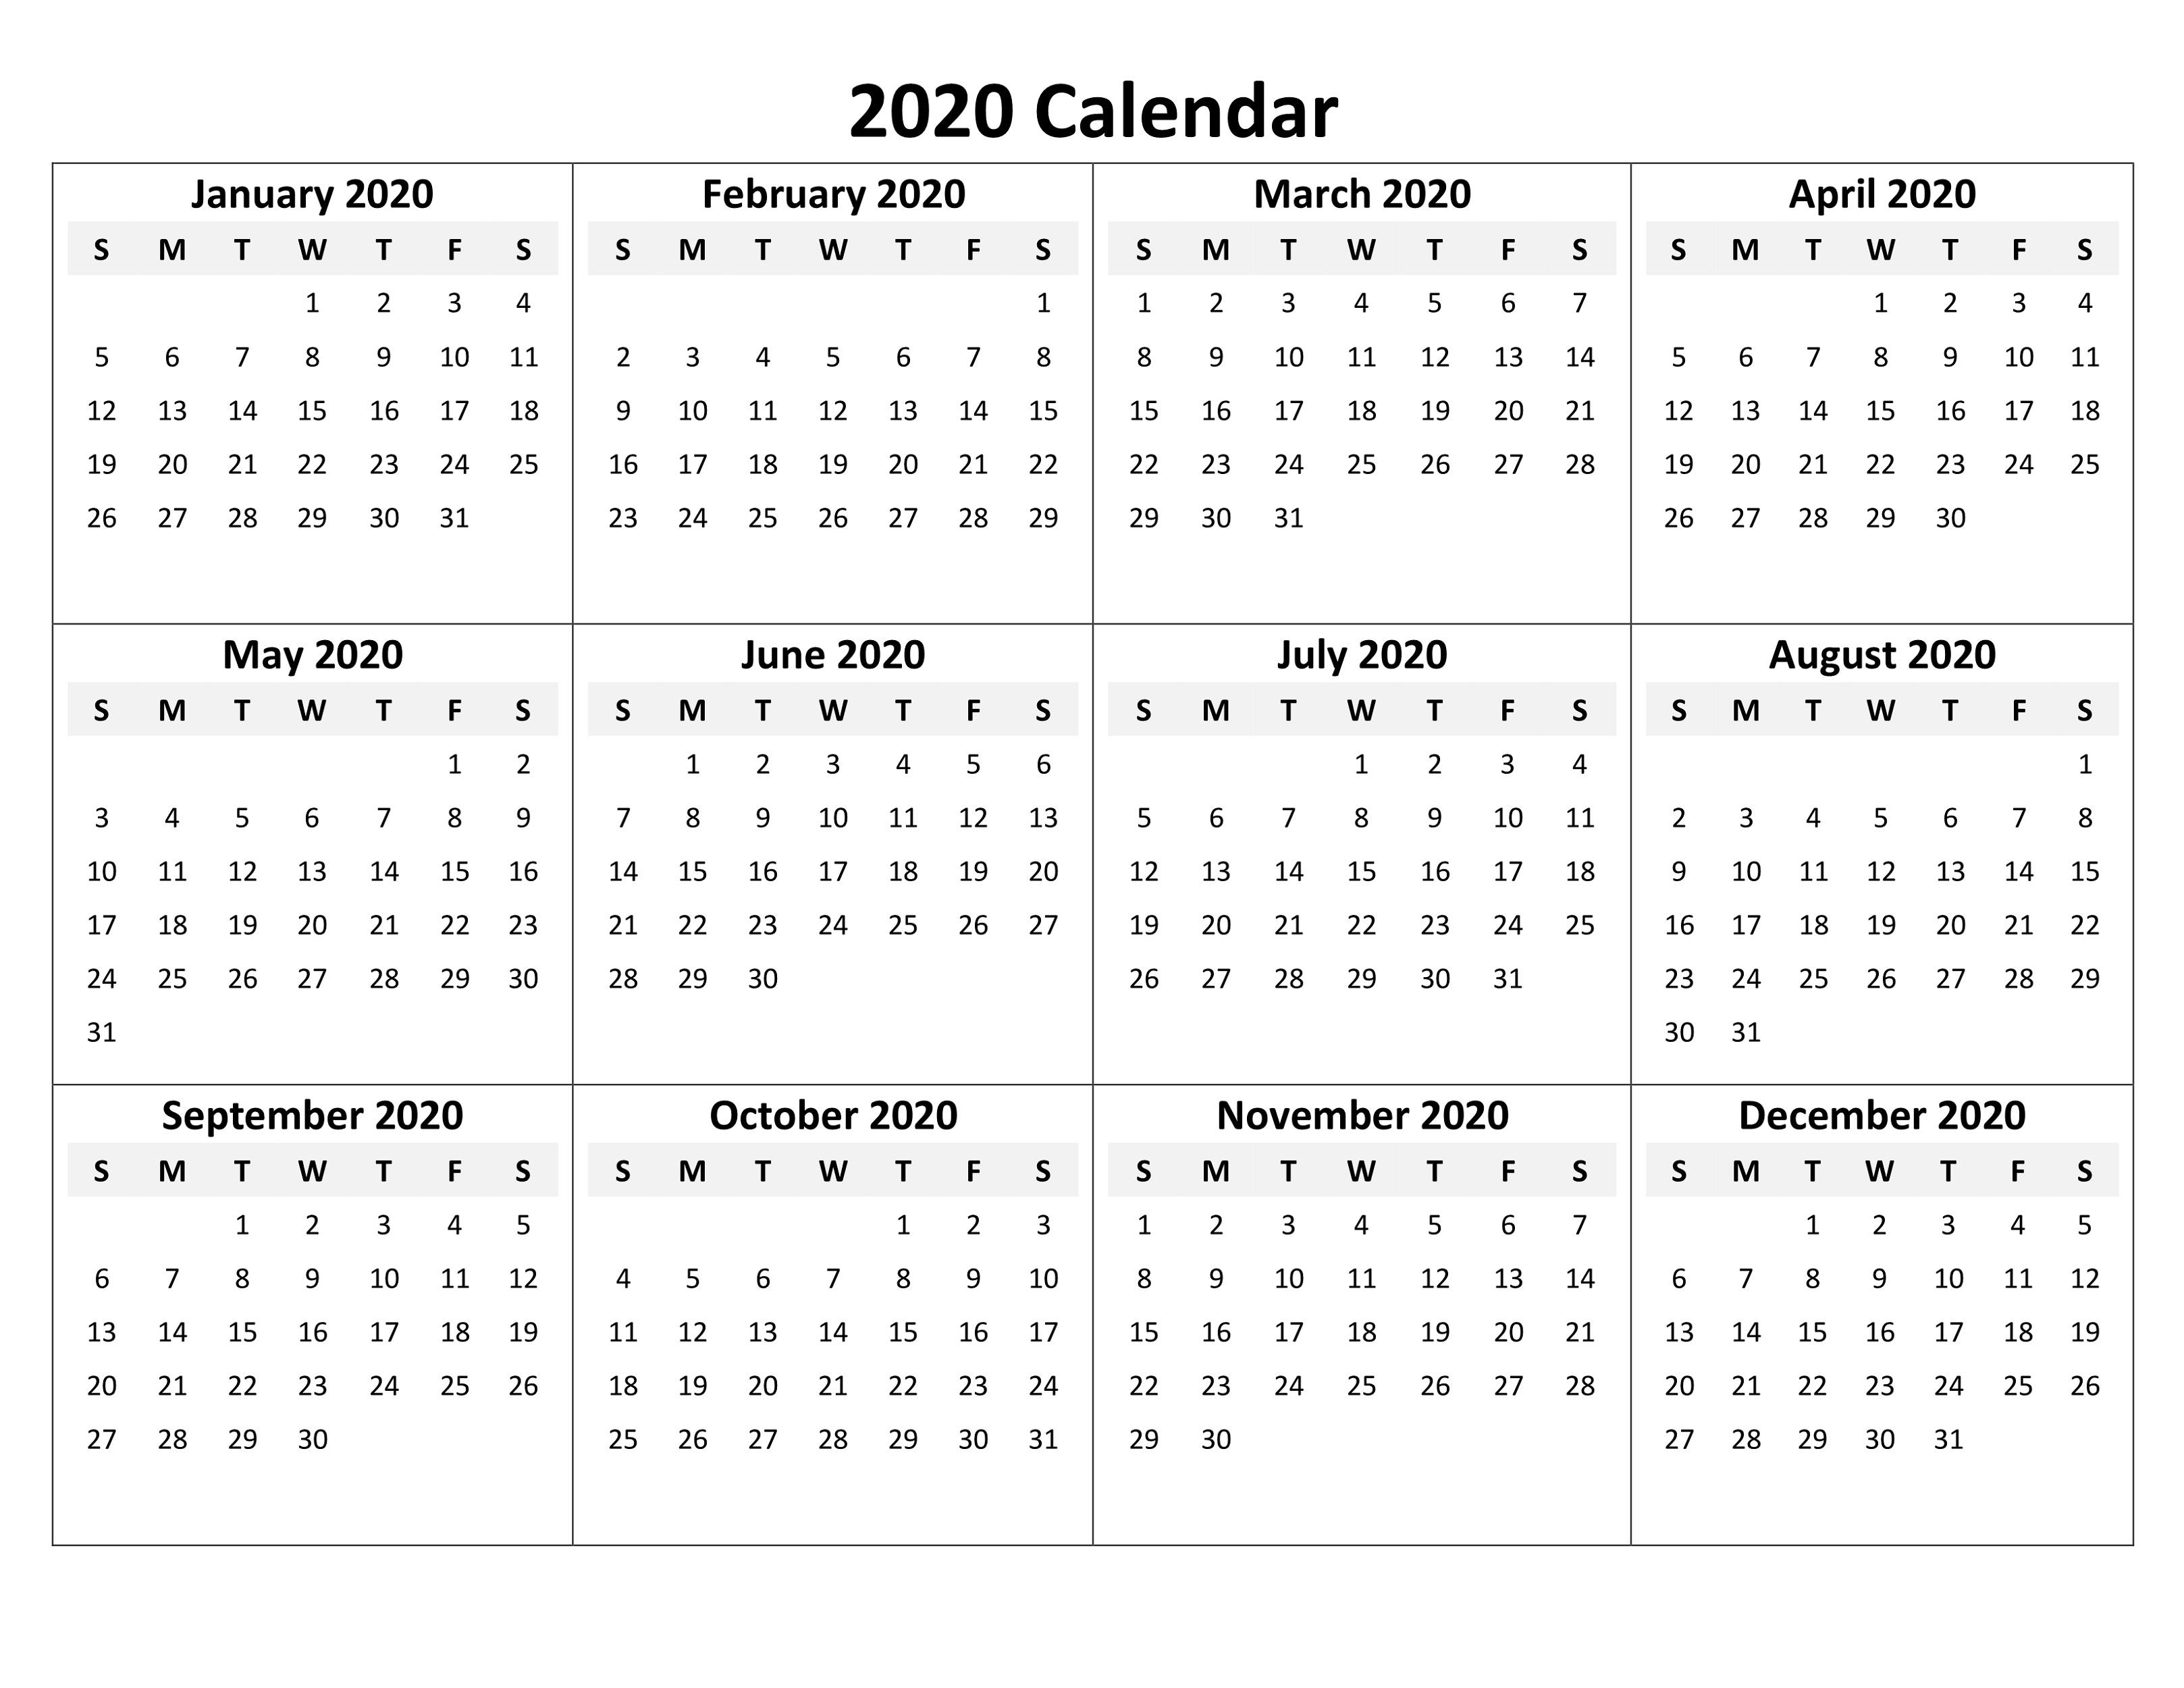 2020 Calendar Excel For Your Good Day For Desk | Calendar with regard to Calendar Excel Template 2020